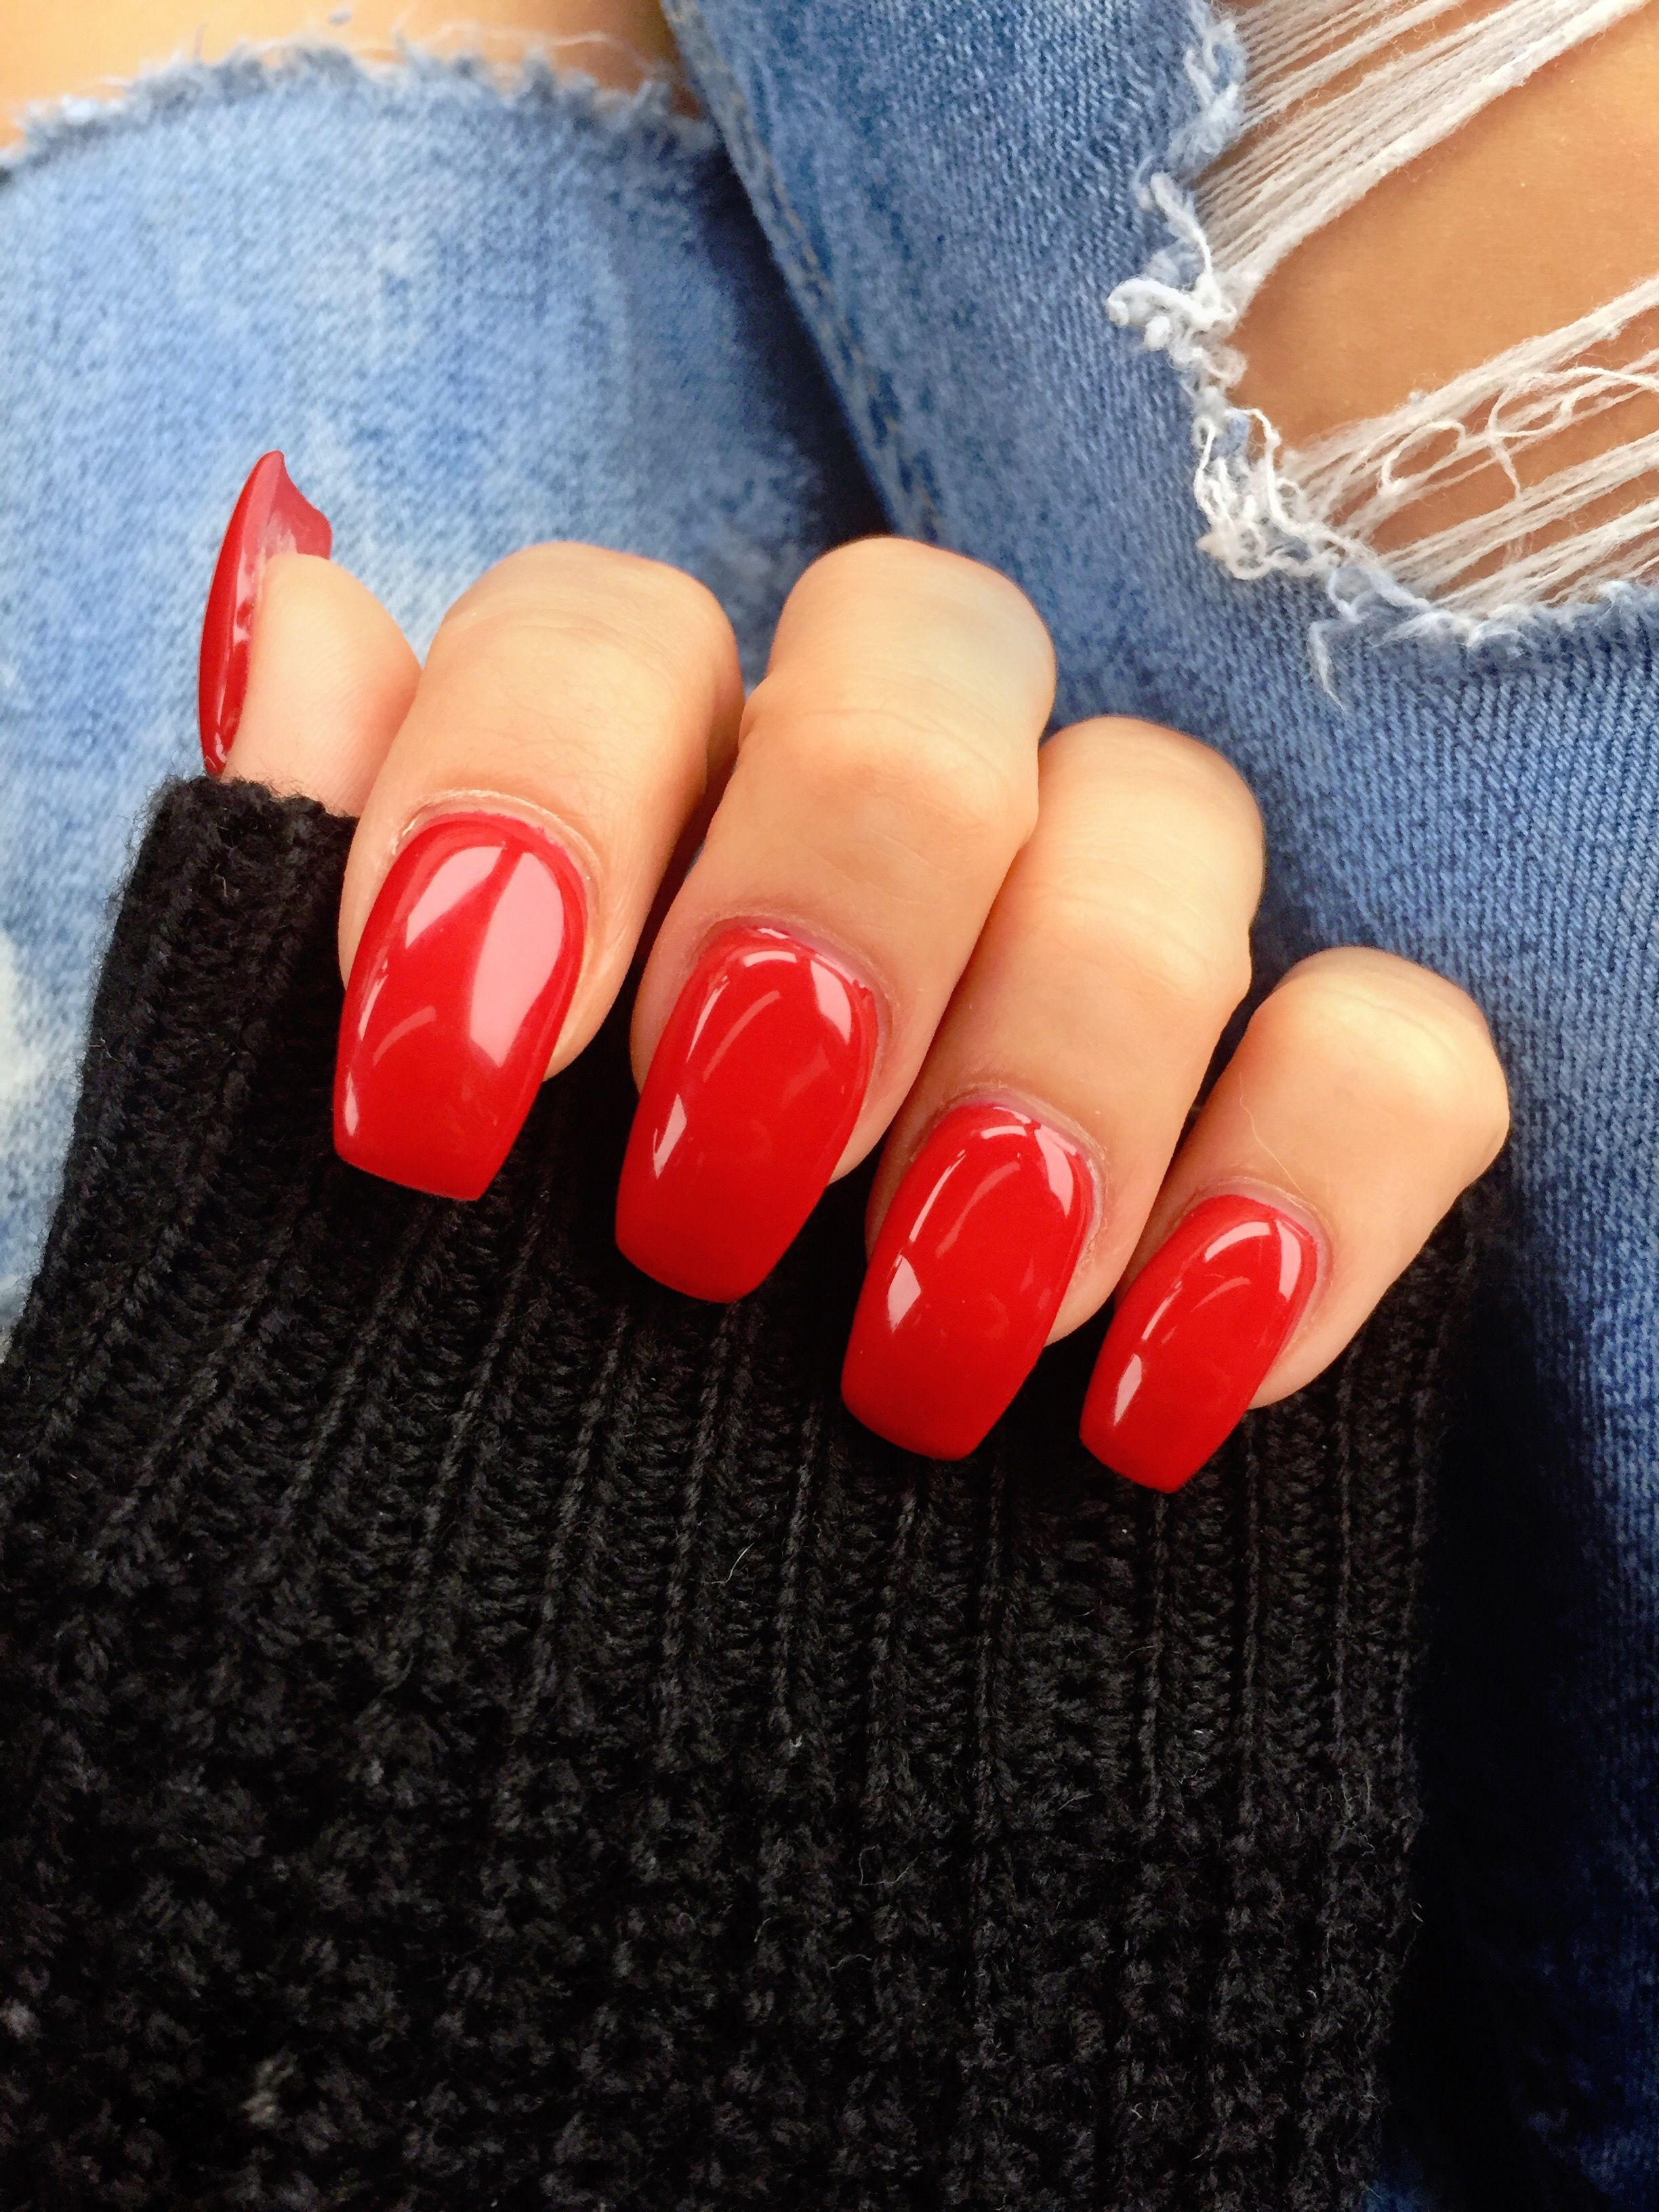 Painted Medium Length Acrylic Nails